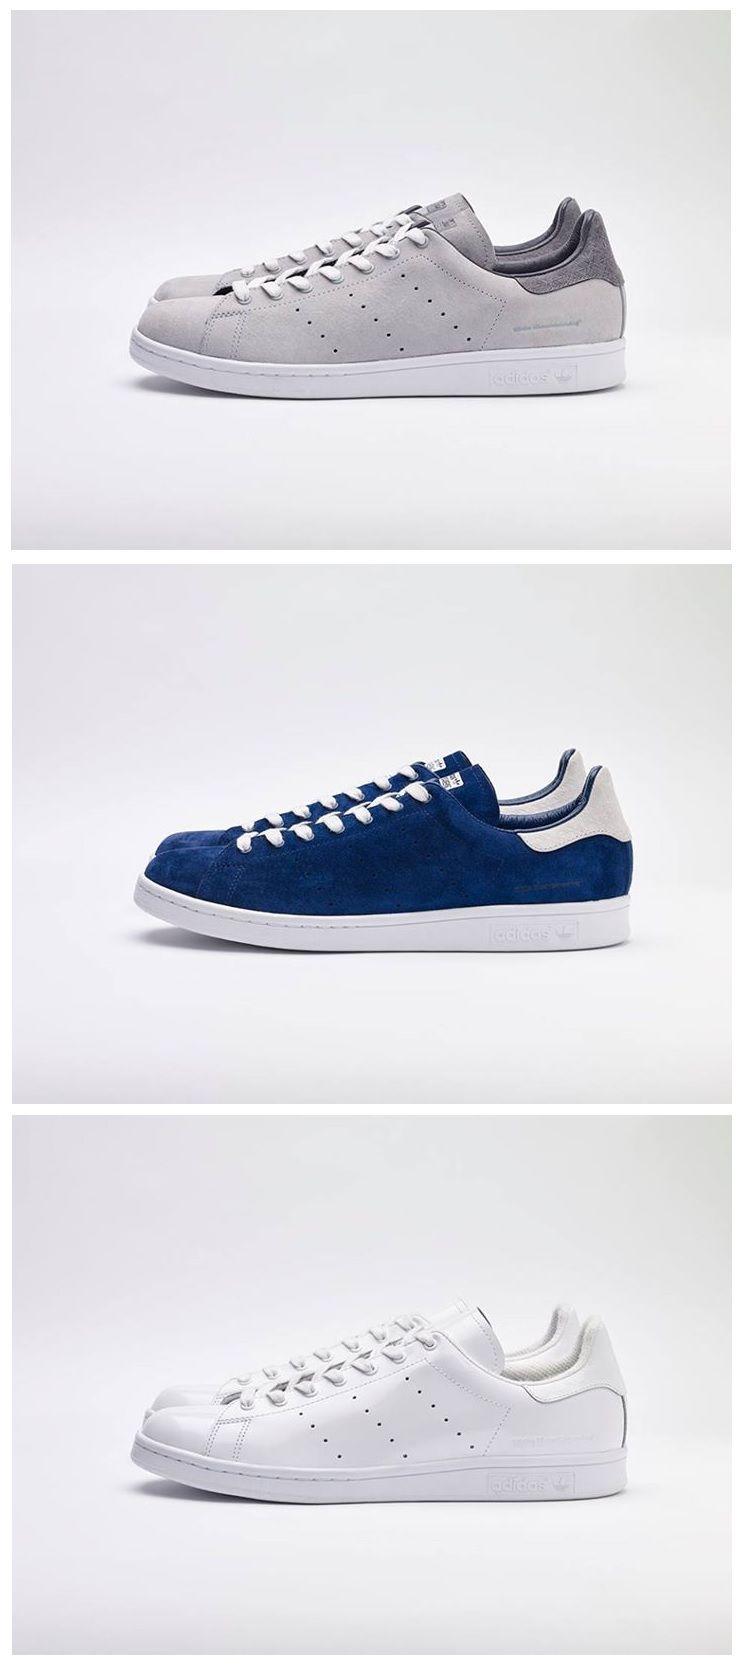 designer fashion 7edb5 79d15 White Mountaineering x adidas Originals Stan Smith